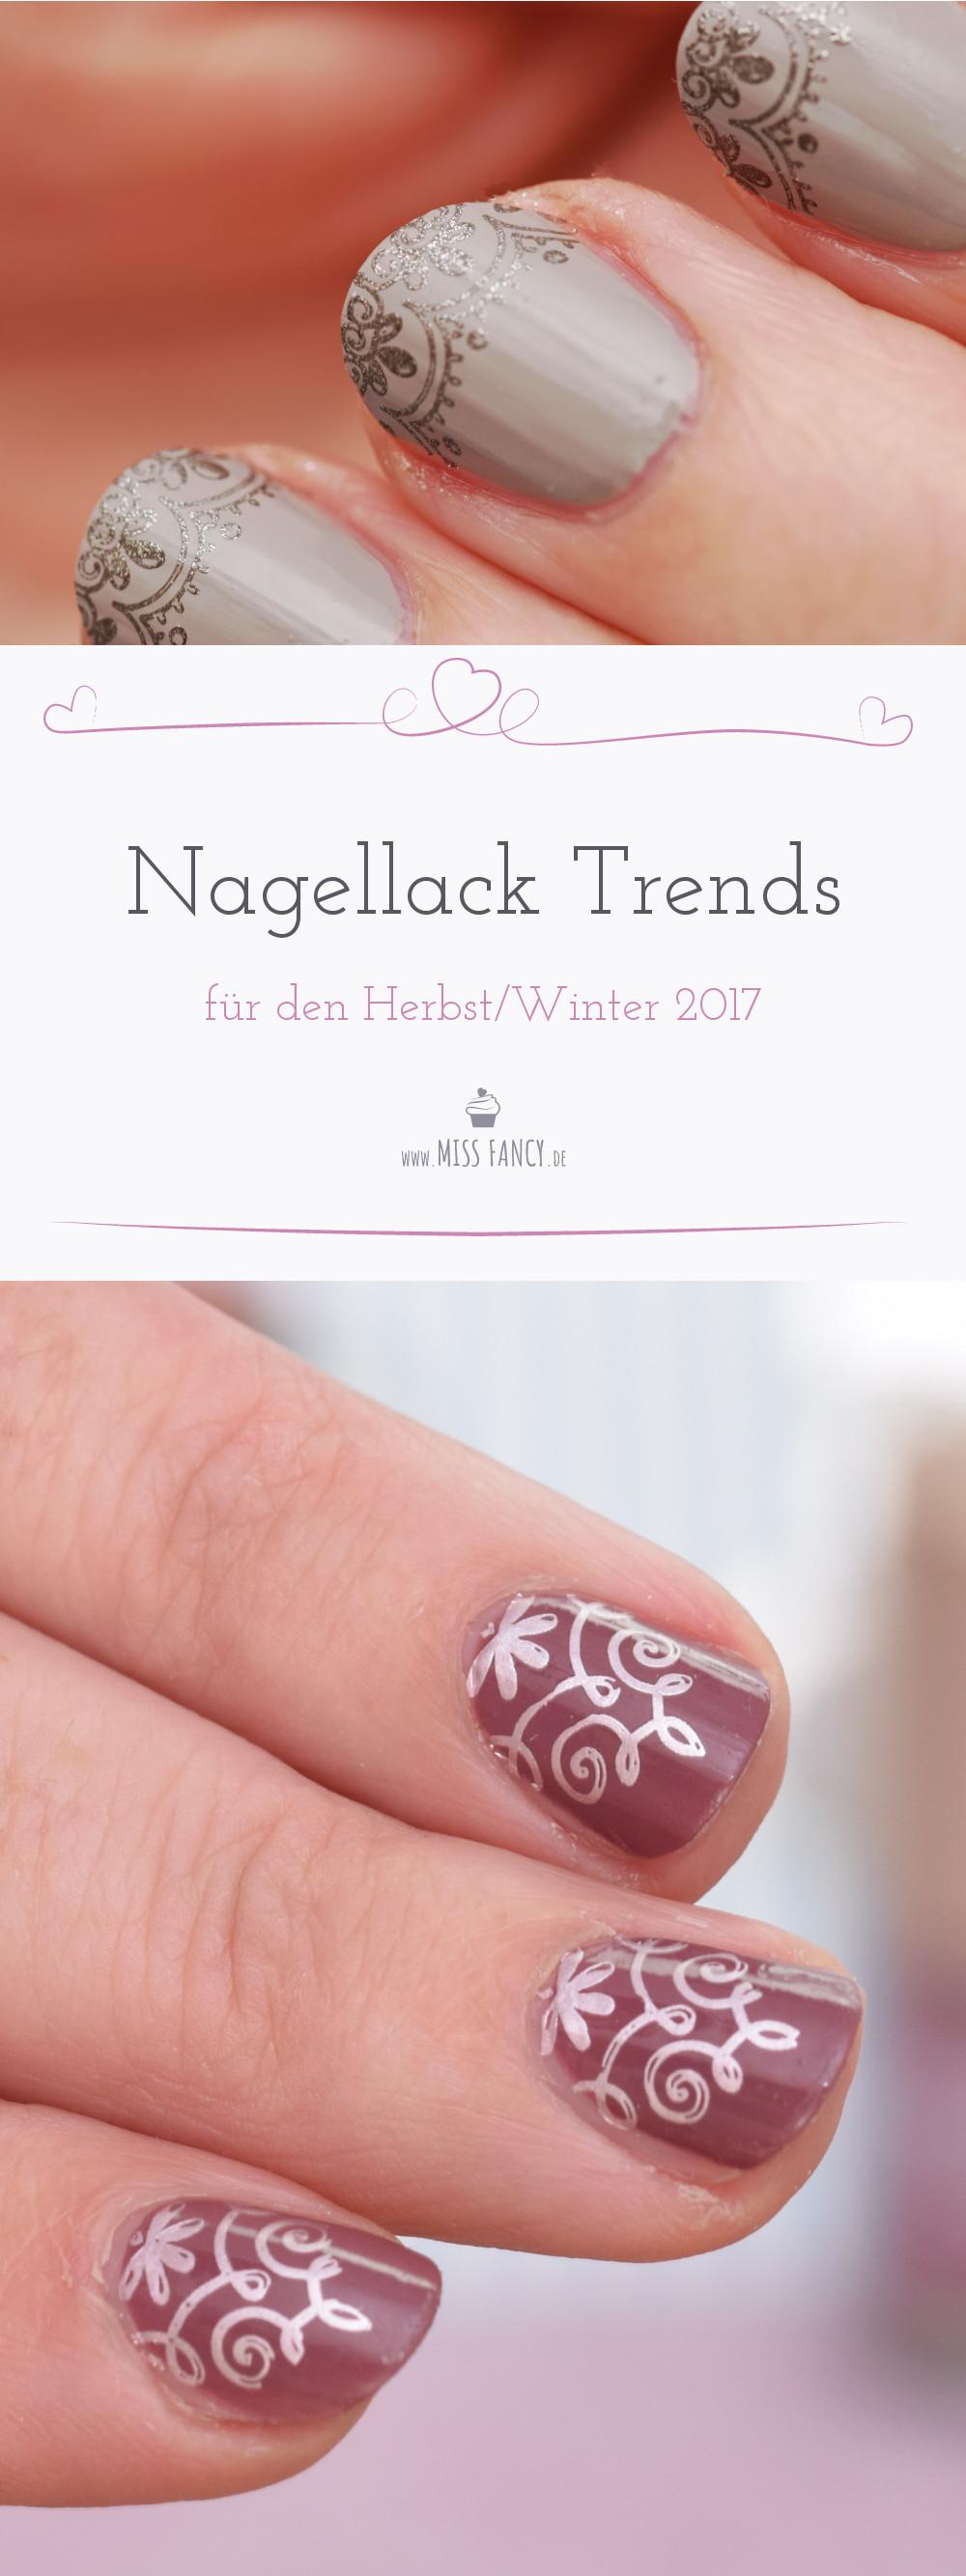 Nagellack-Trends-Herbst-Winter-2017-Missfancy-Beautyblog